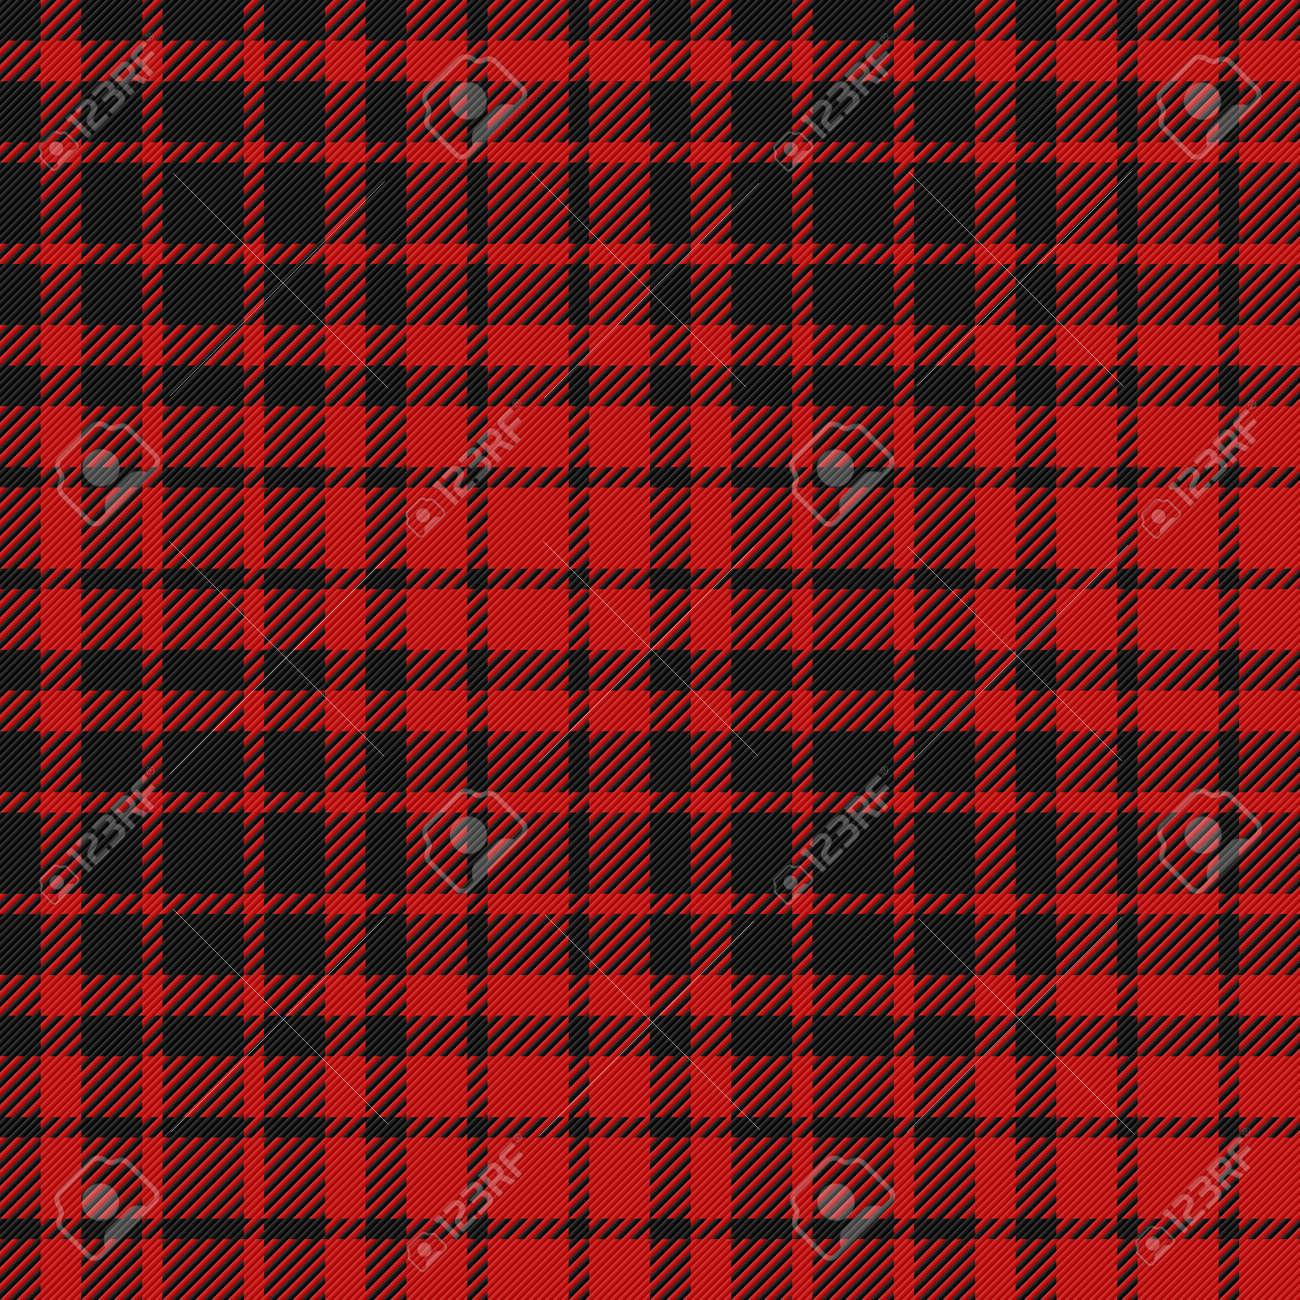 Flannel pattern seamless illustration - 59794920